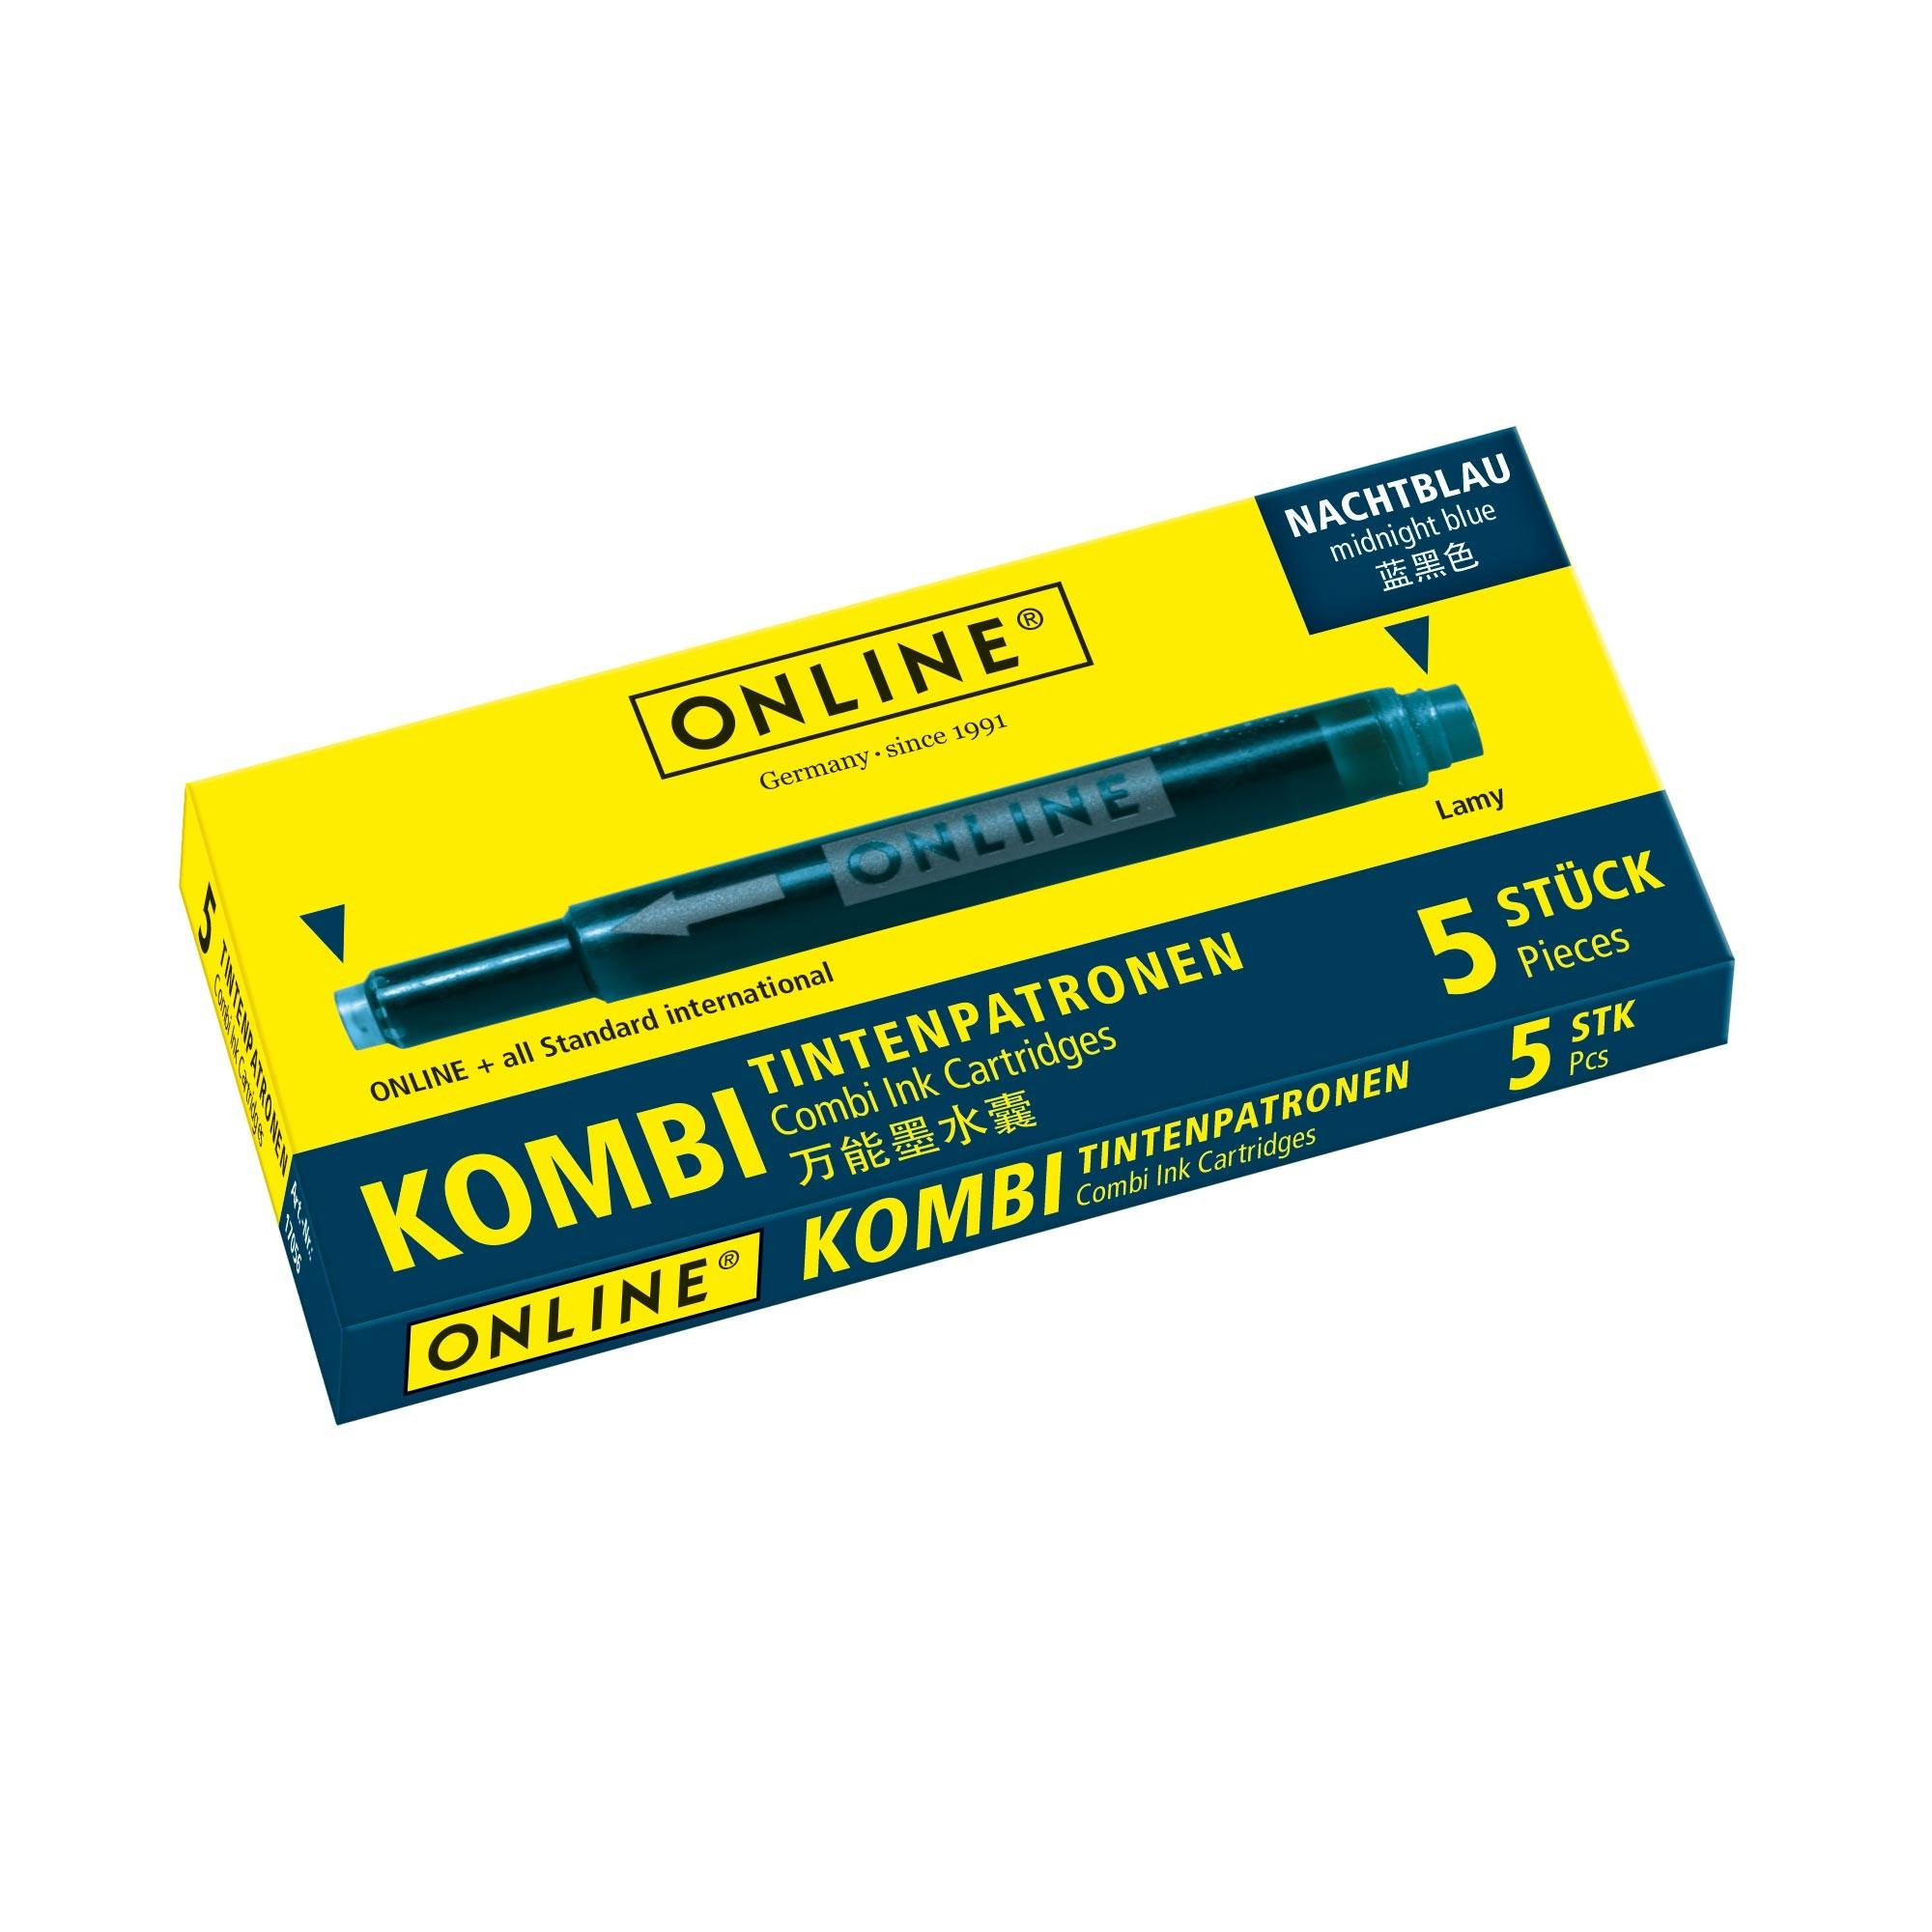 Online Kombi Cartridges